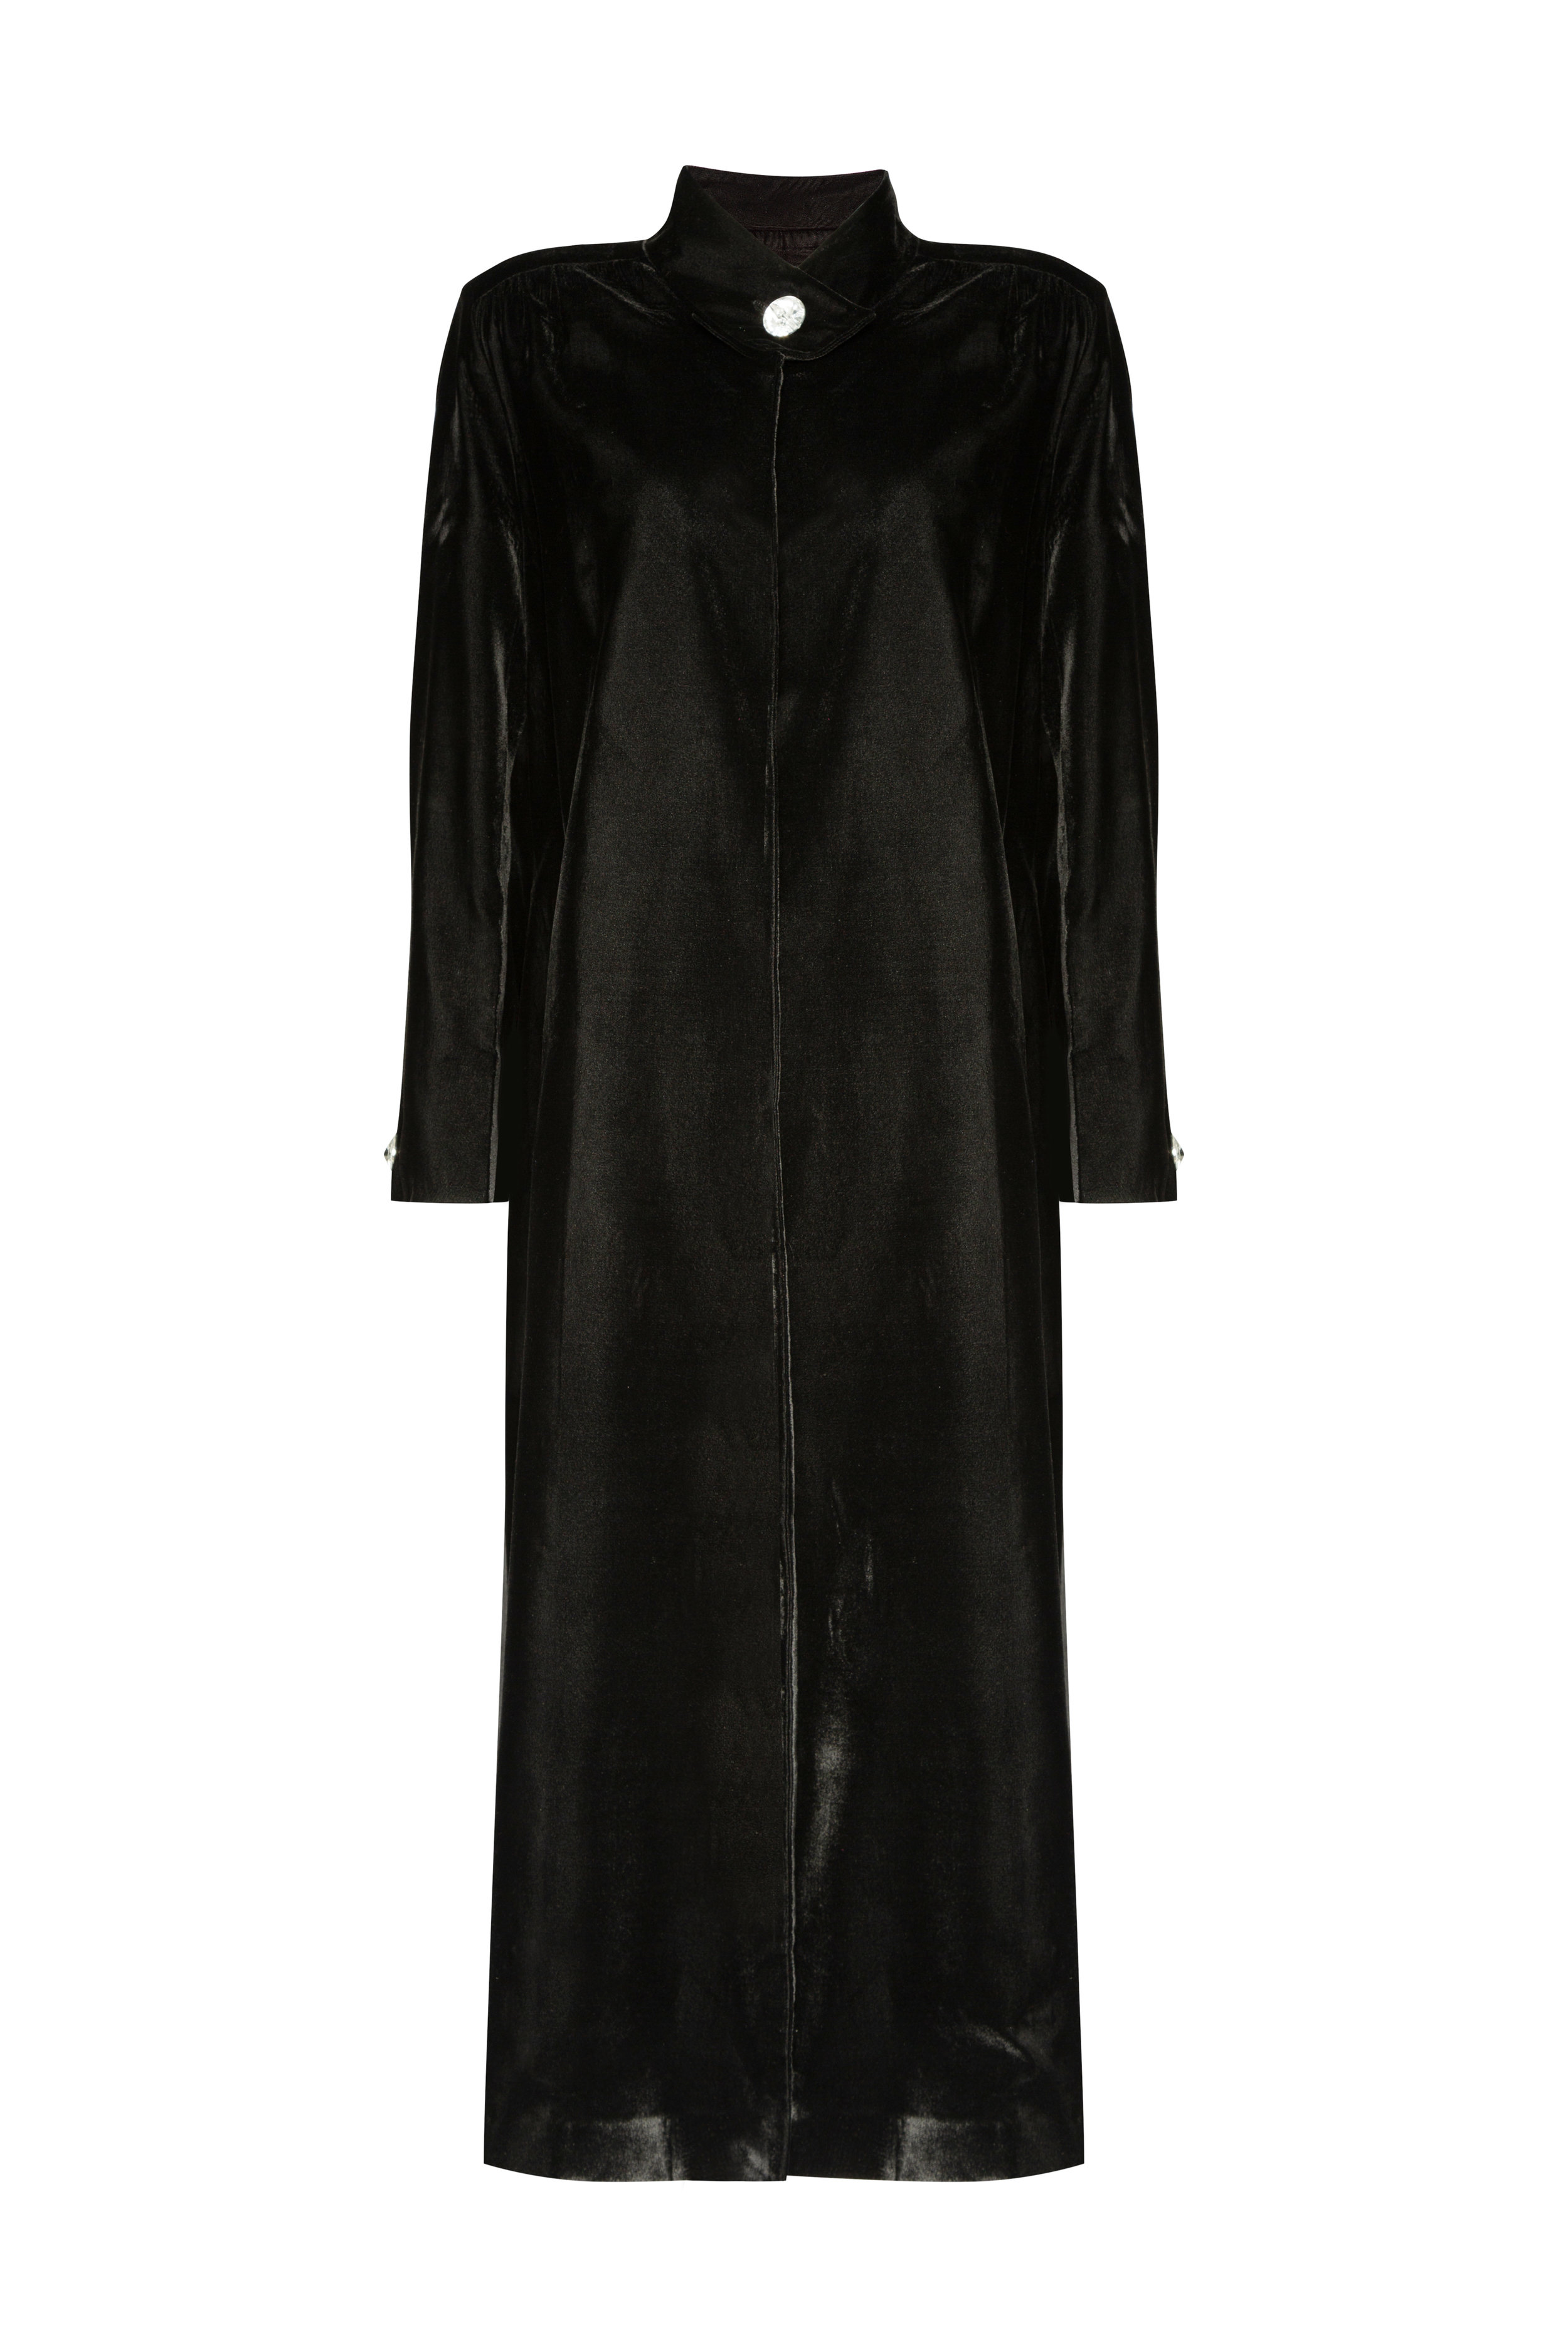 COMPLETE THE LOOK - Martine Coat 420 USD